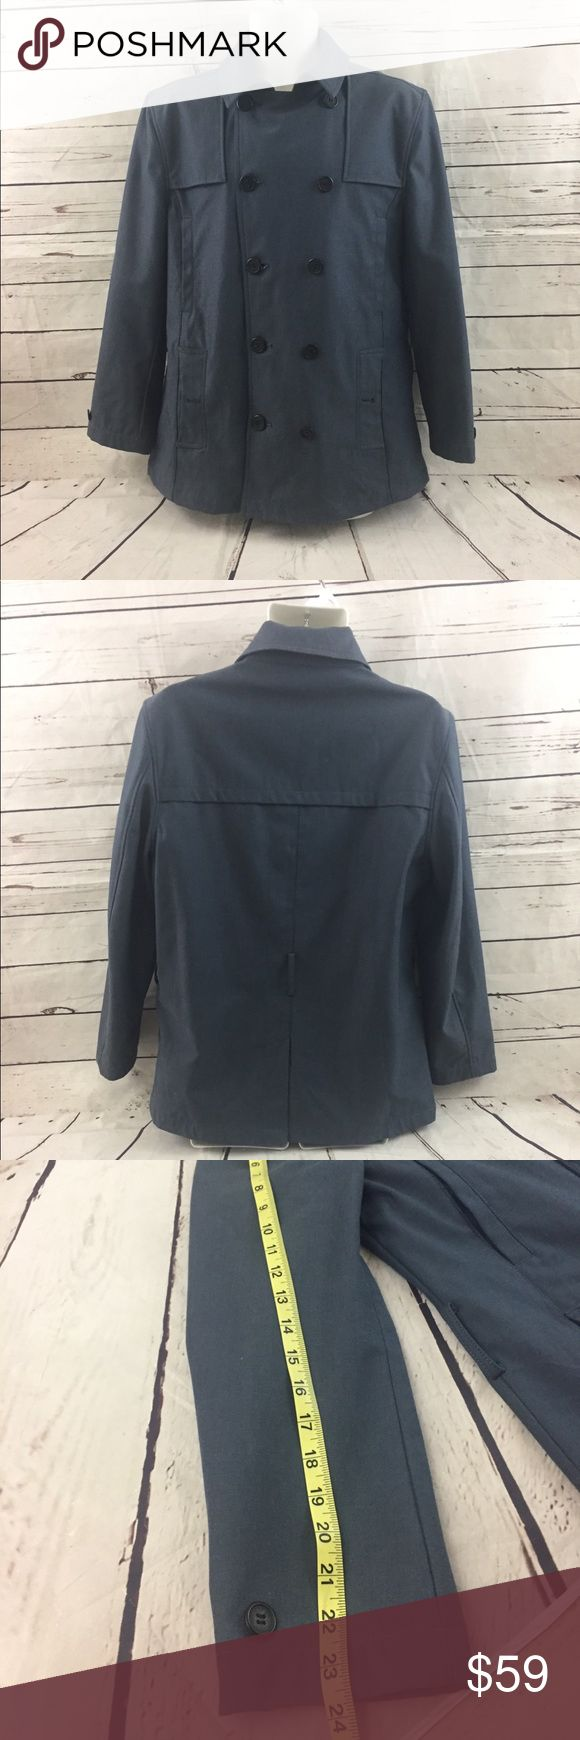 Topman Jacket Topman Jacket Topman Jackets & Coats Trench Coats